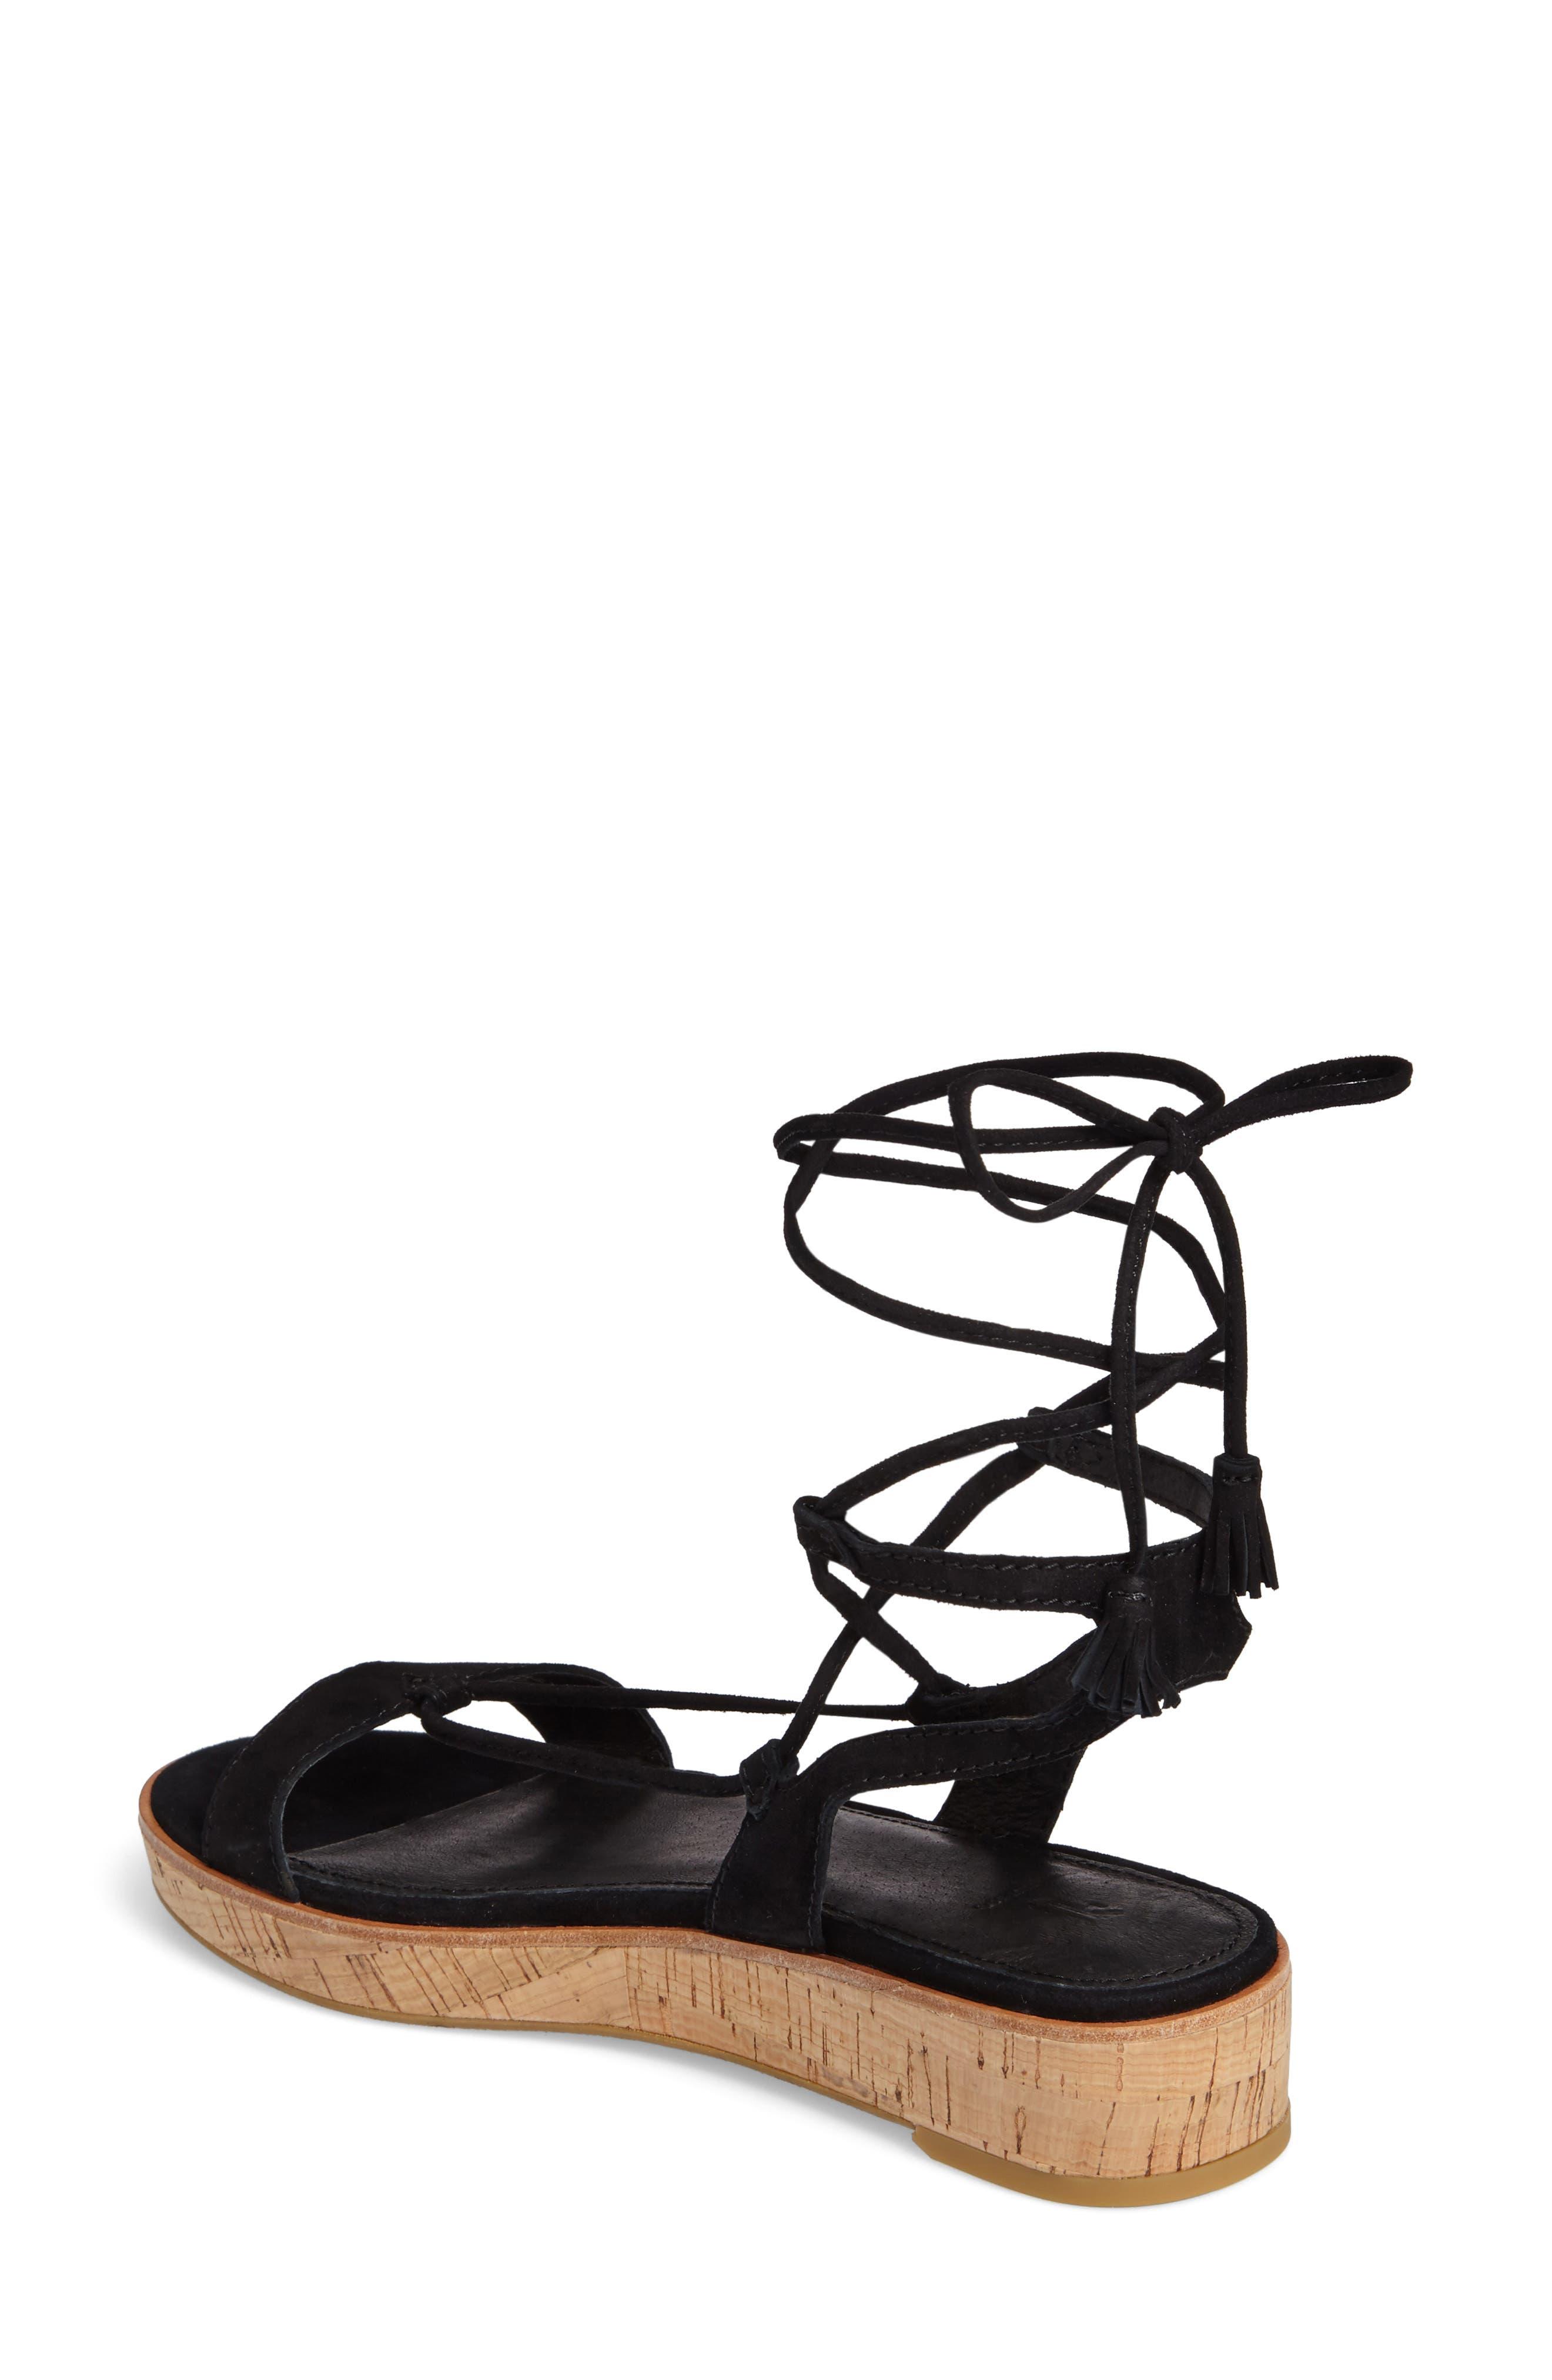 Miranda Gladiator Platform Sandal,                             Alternate thumbnail 2, color,                             Black Suede